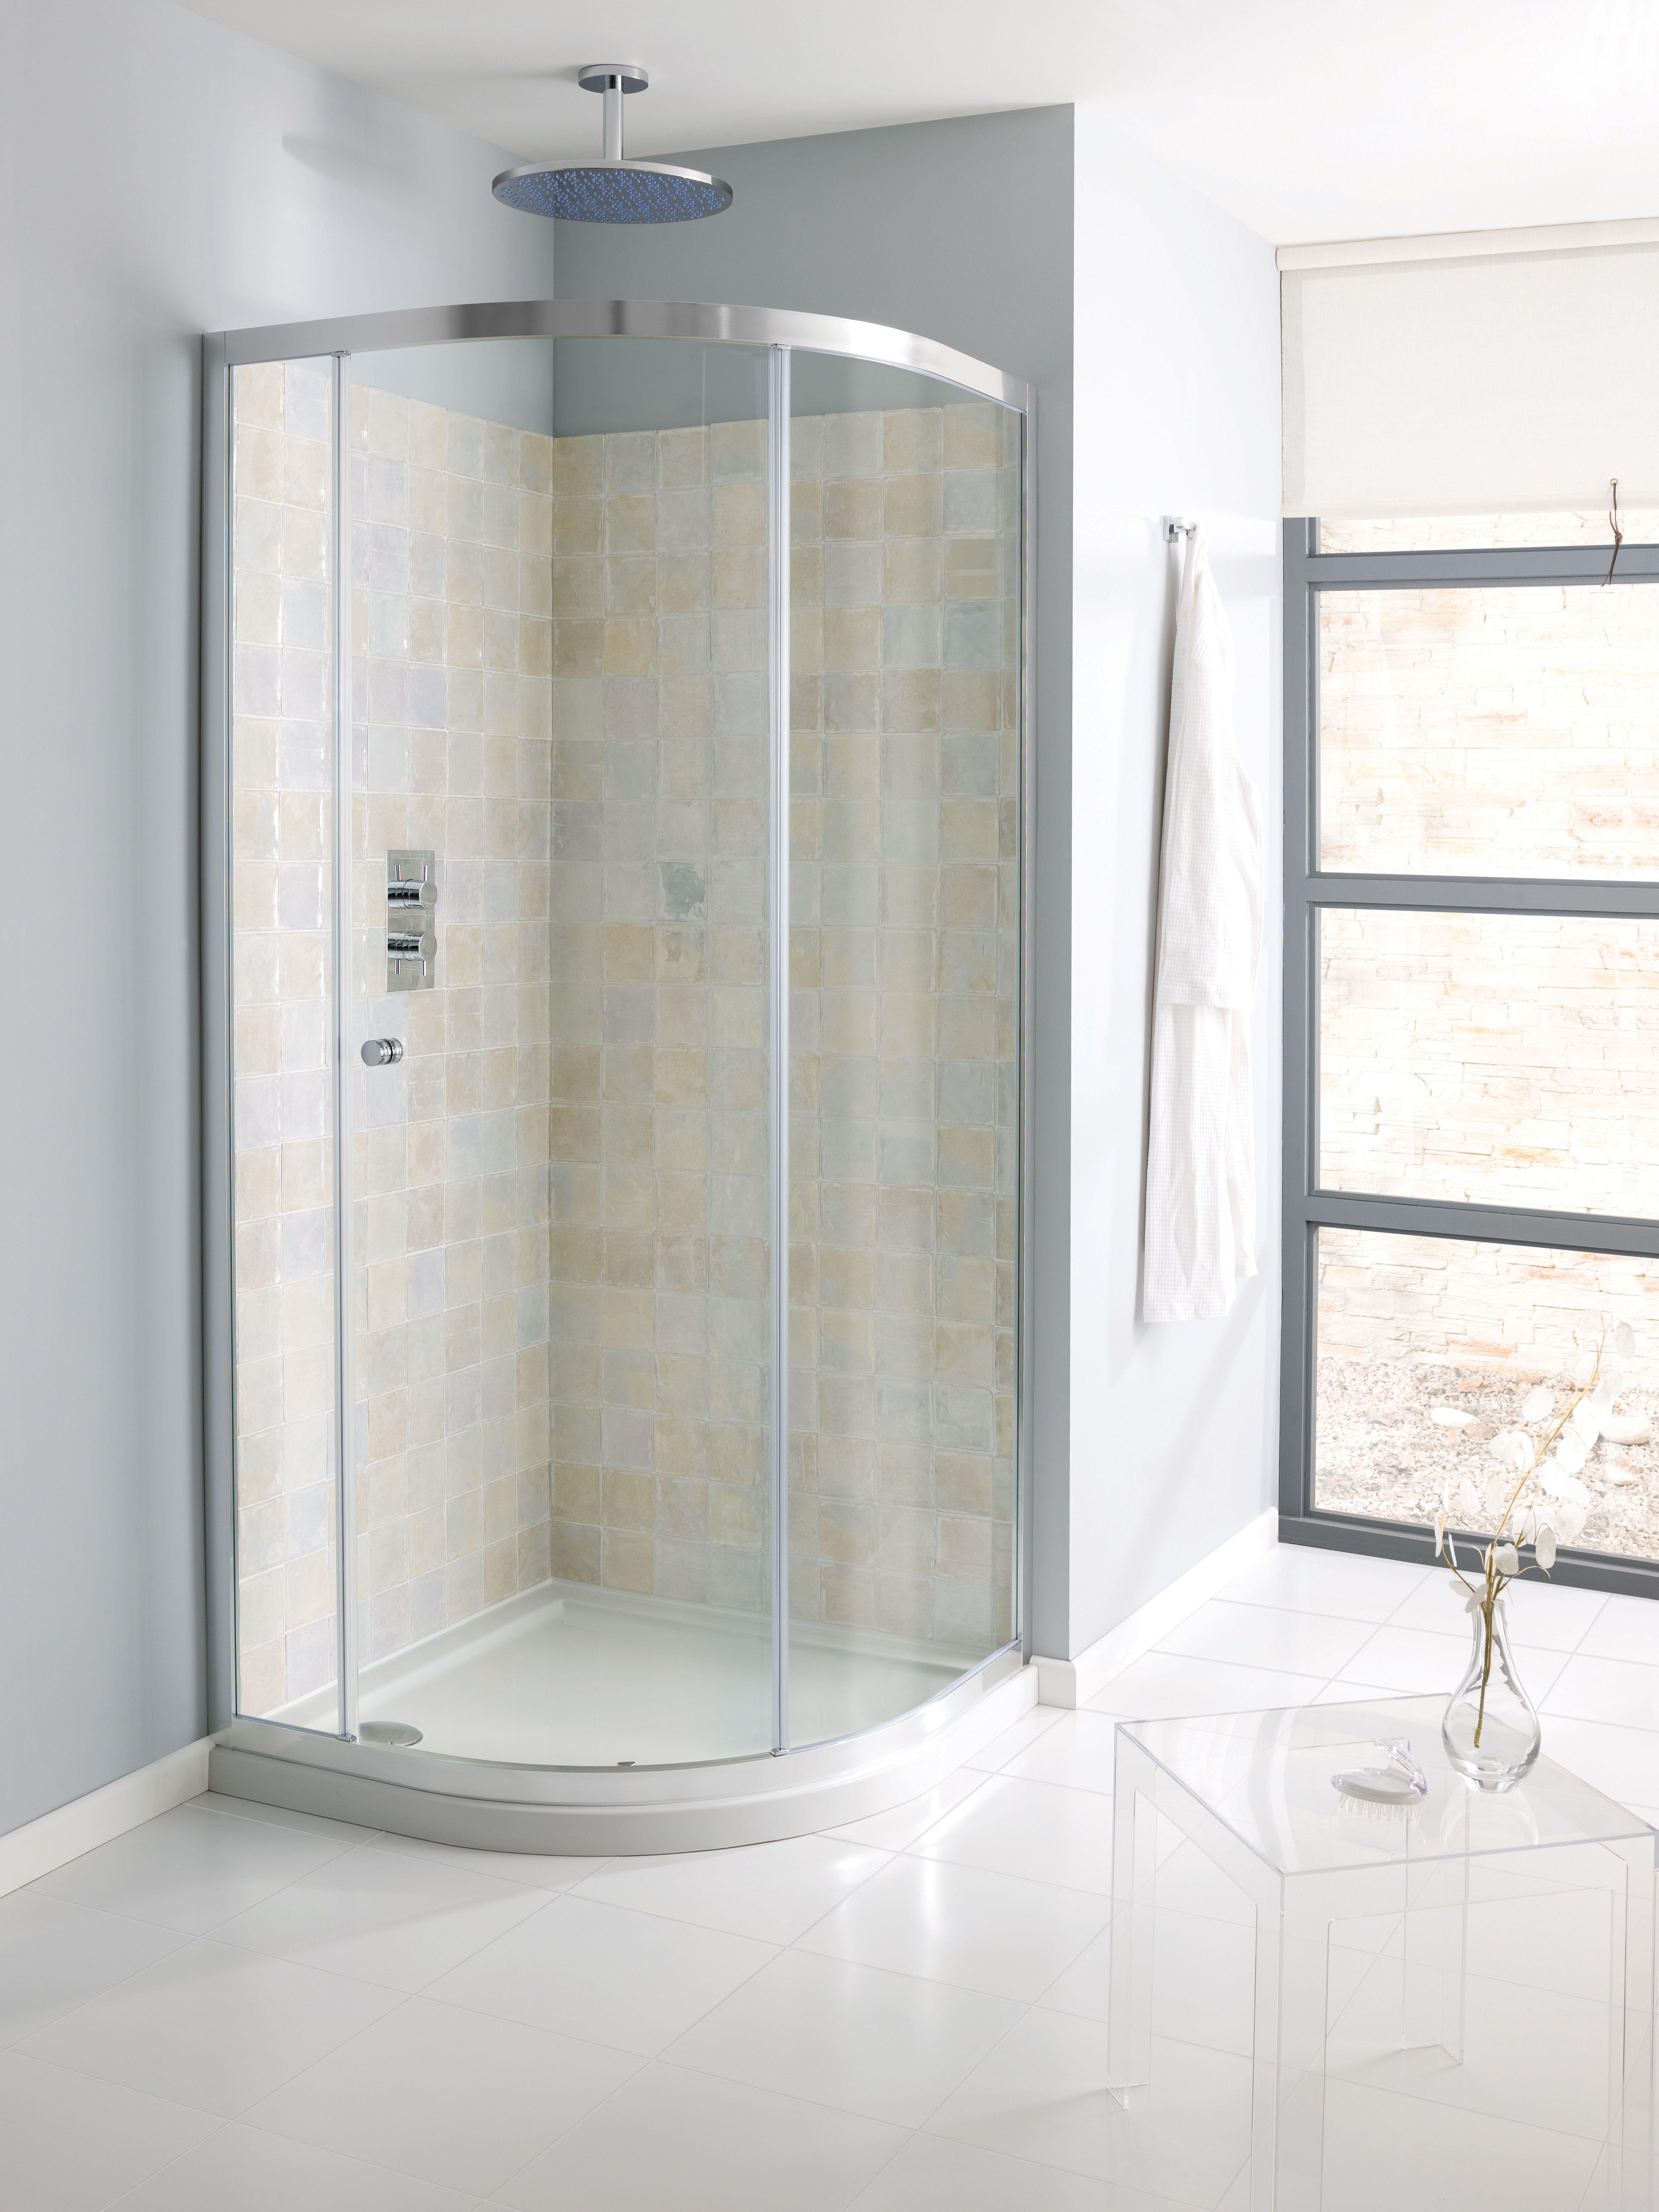 Pin by Mayra Yamazato on bathroom | Pinterest | Bathroom shower ...